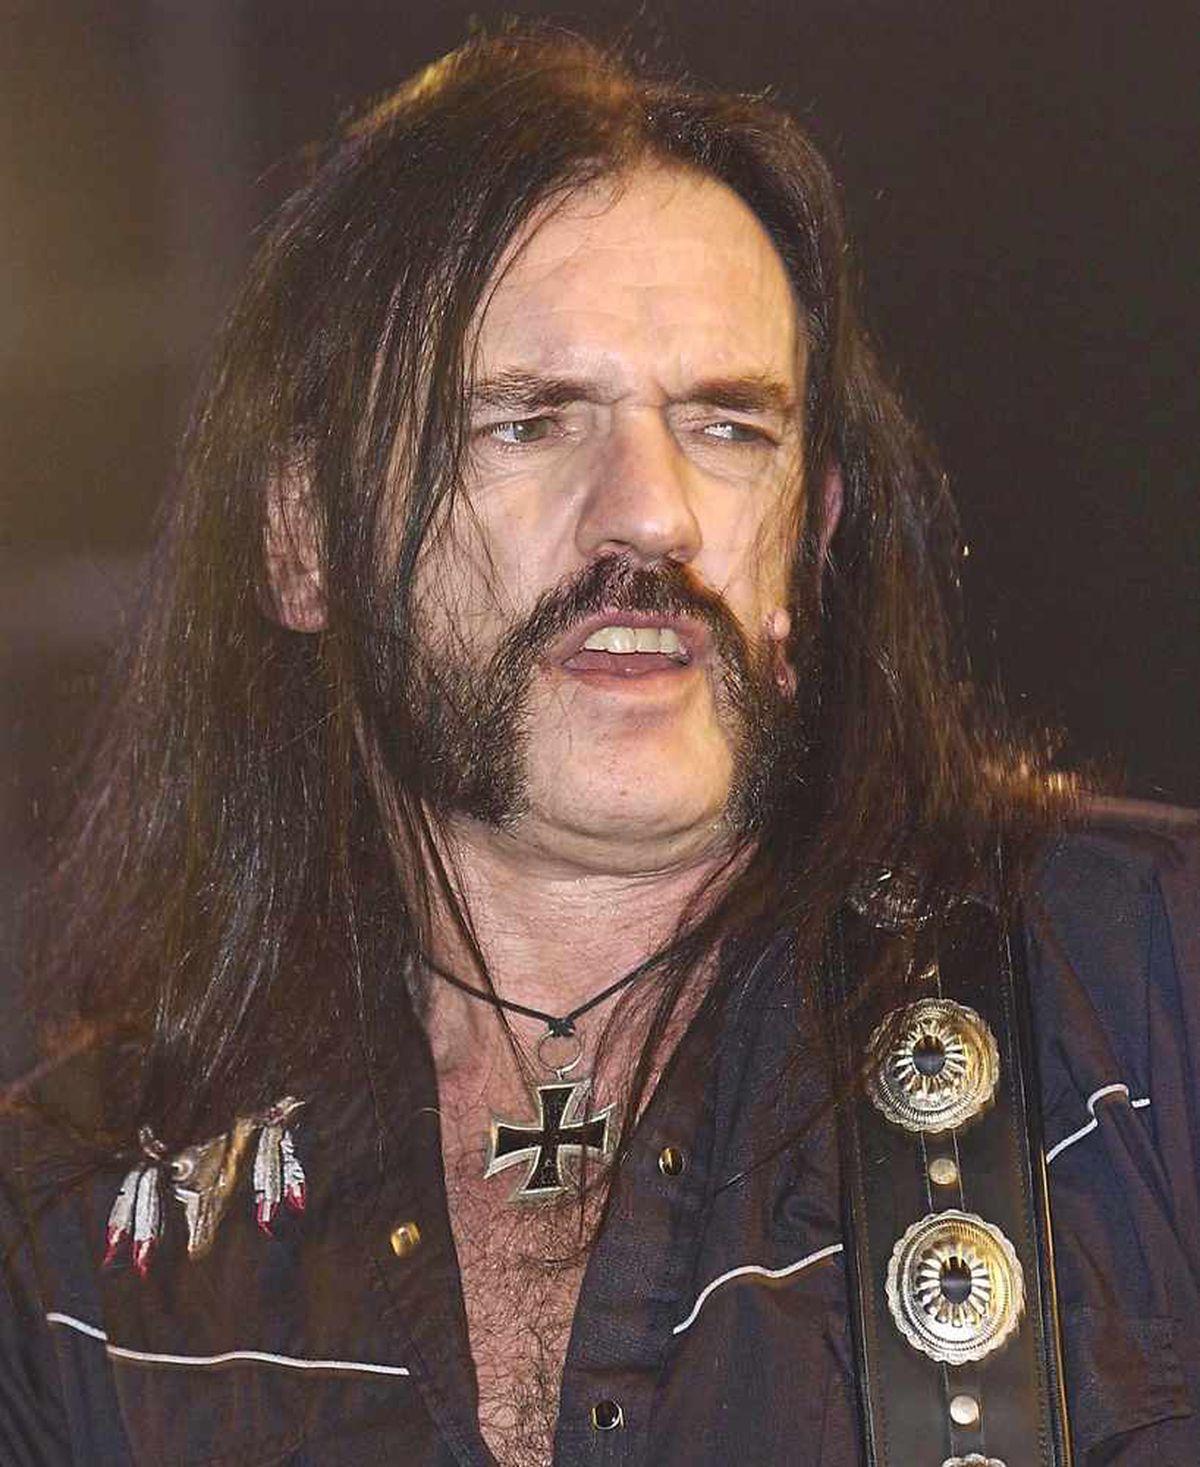 Lemmy from Motorhead, who used Trisha's